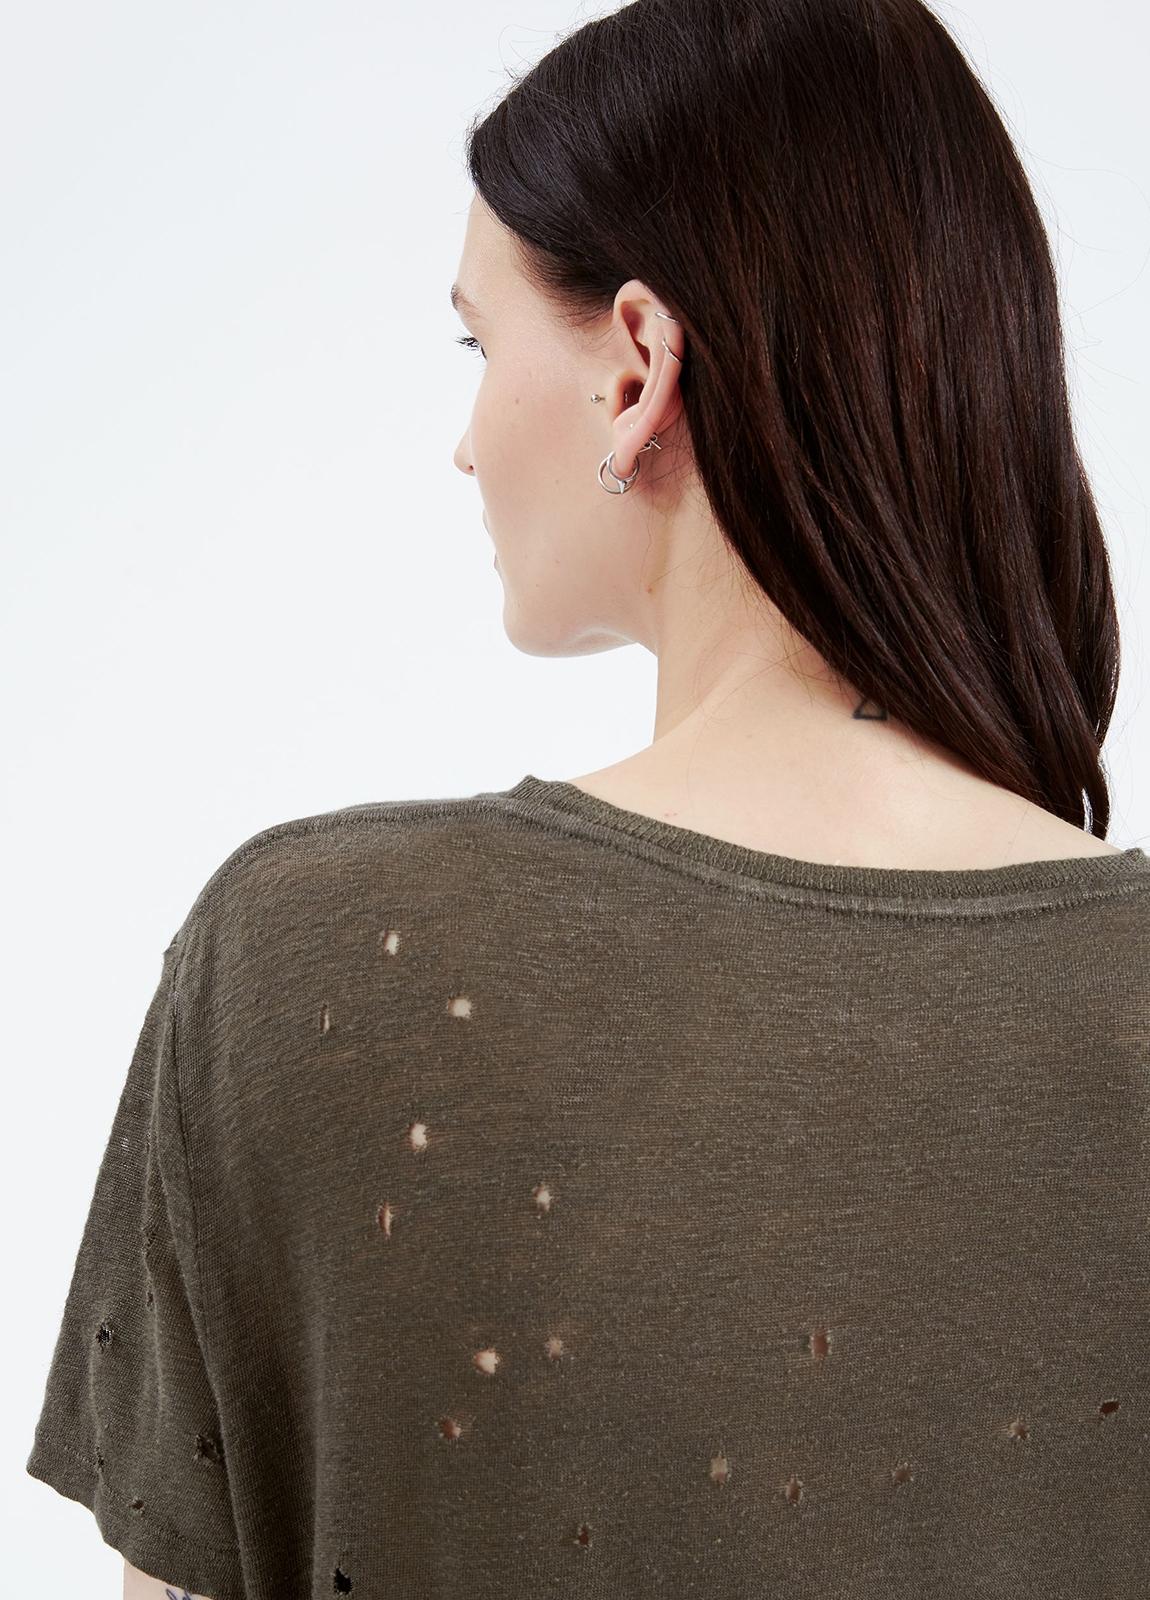 Camiseta woman color kaki con detalles calados. 100% Lino. - Ítem1